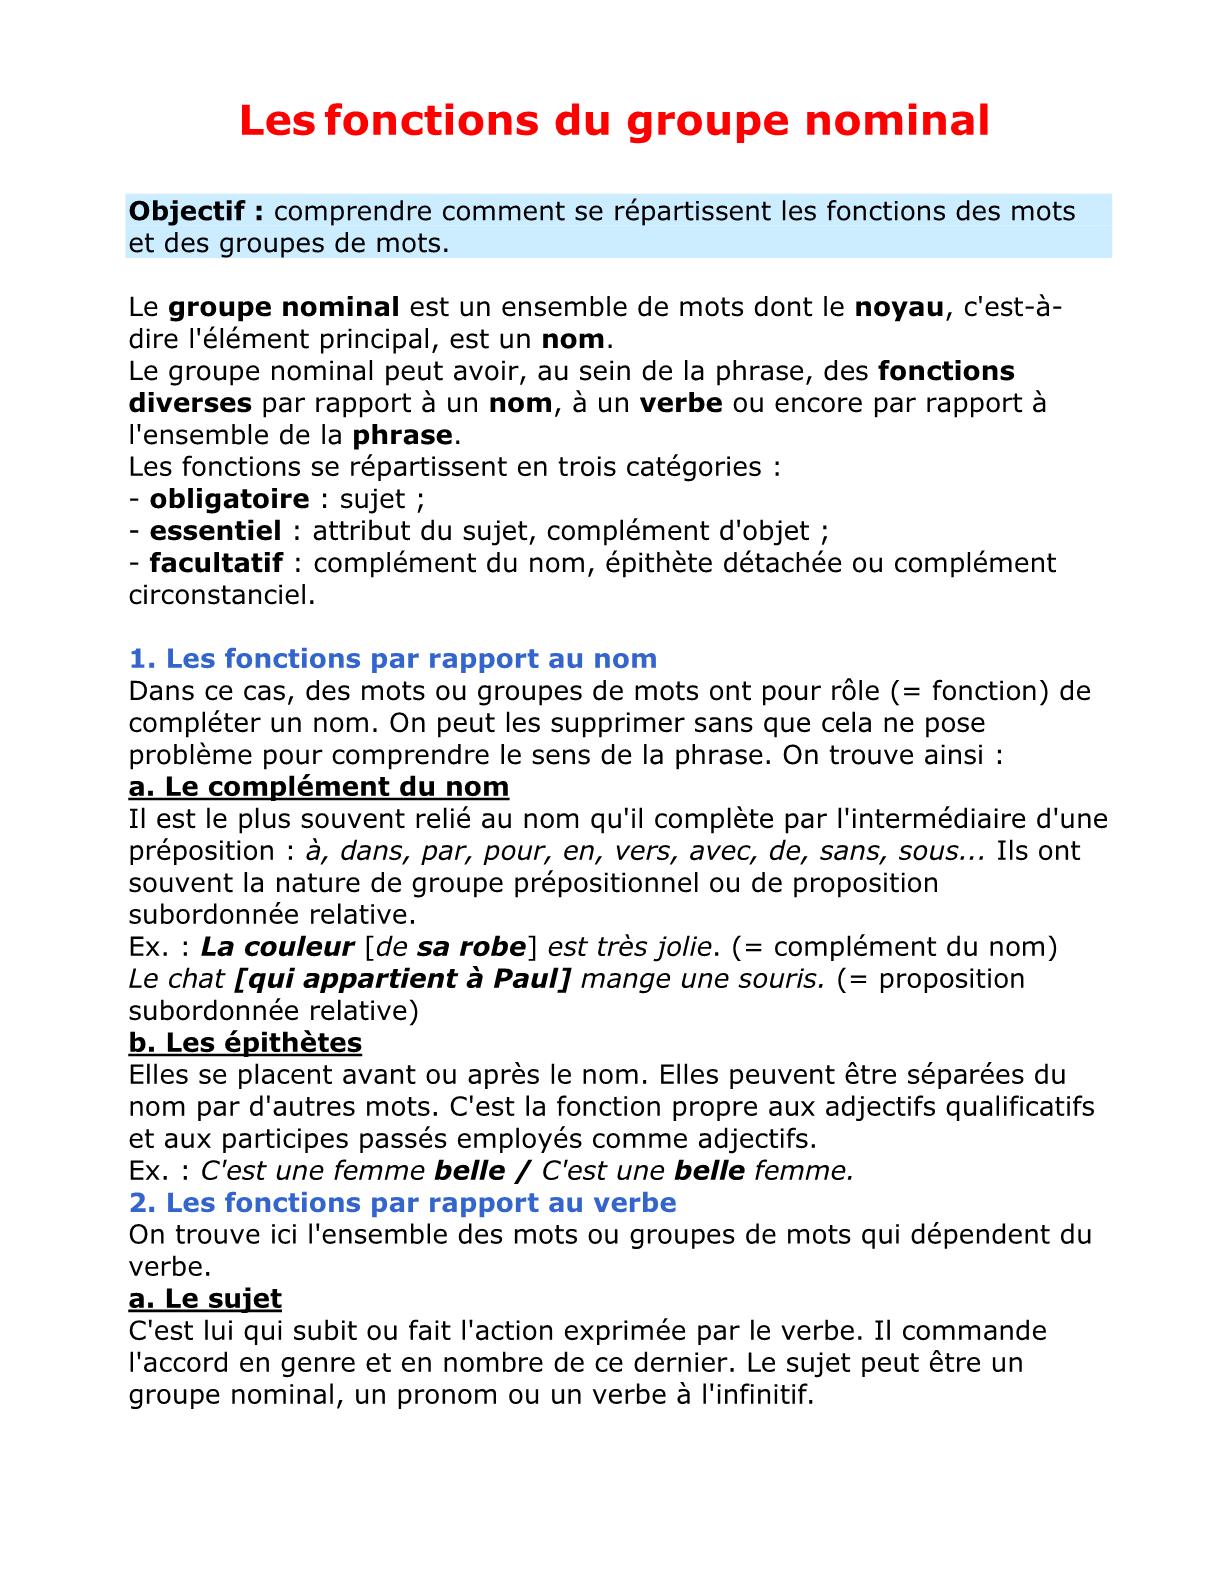 درس Les fonctions du groupe nominal للسنة الأولى إعدادي